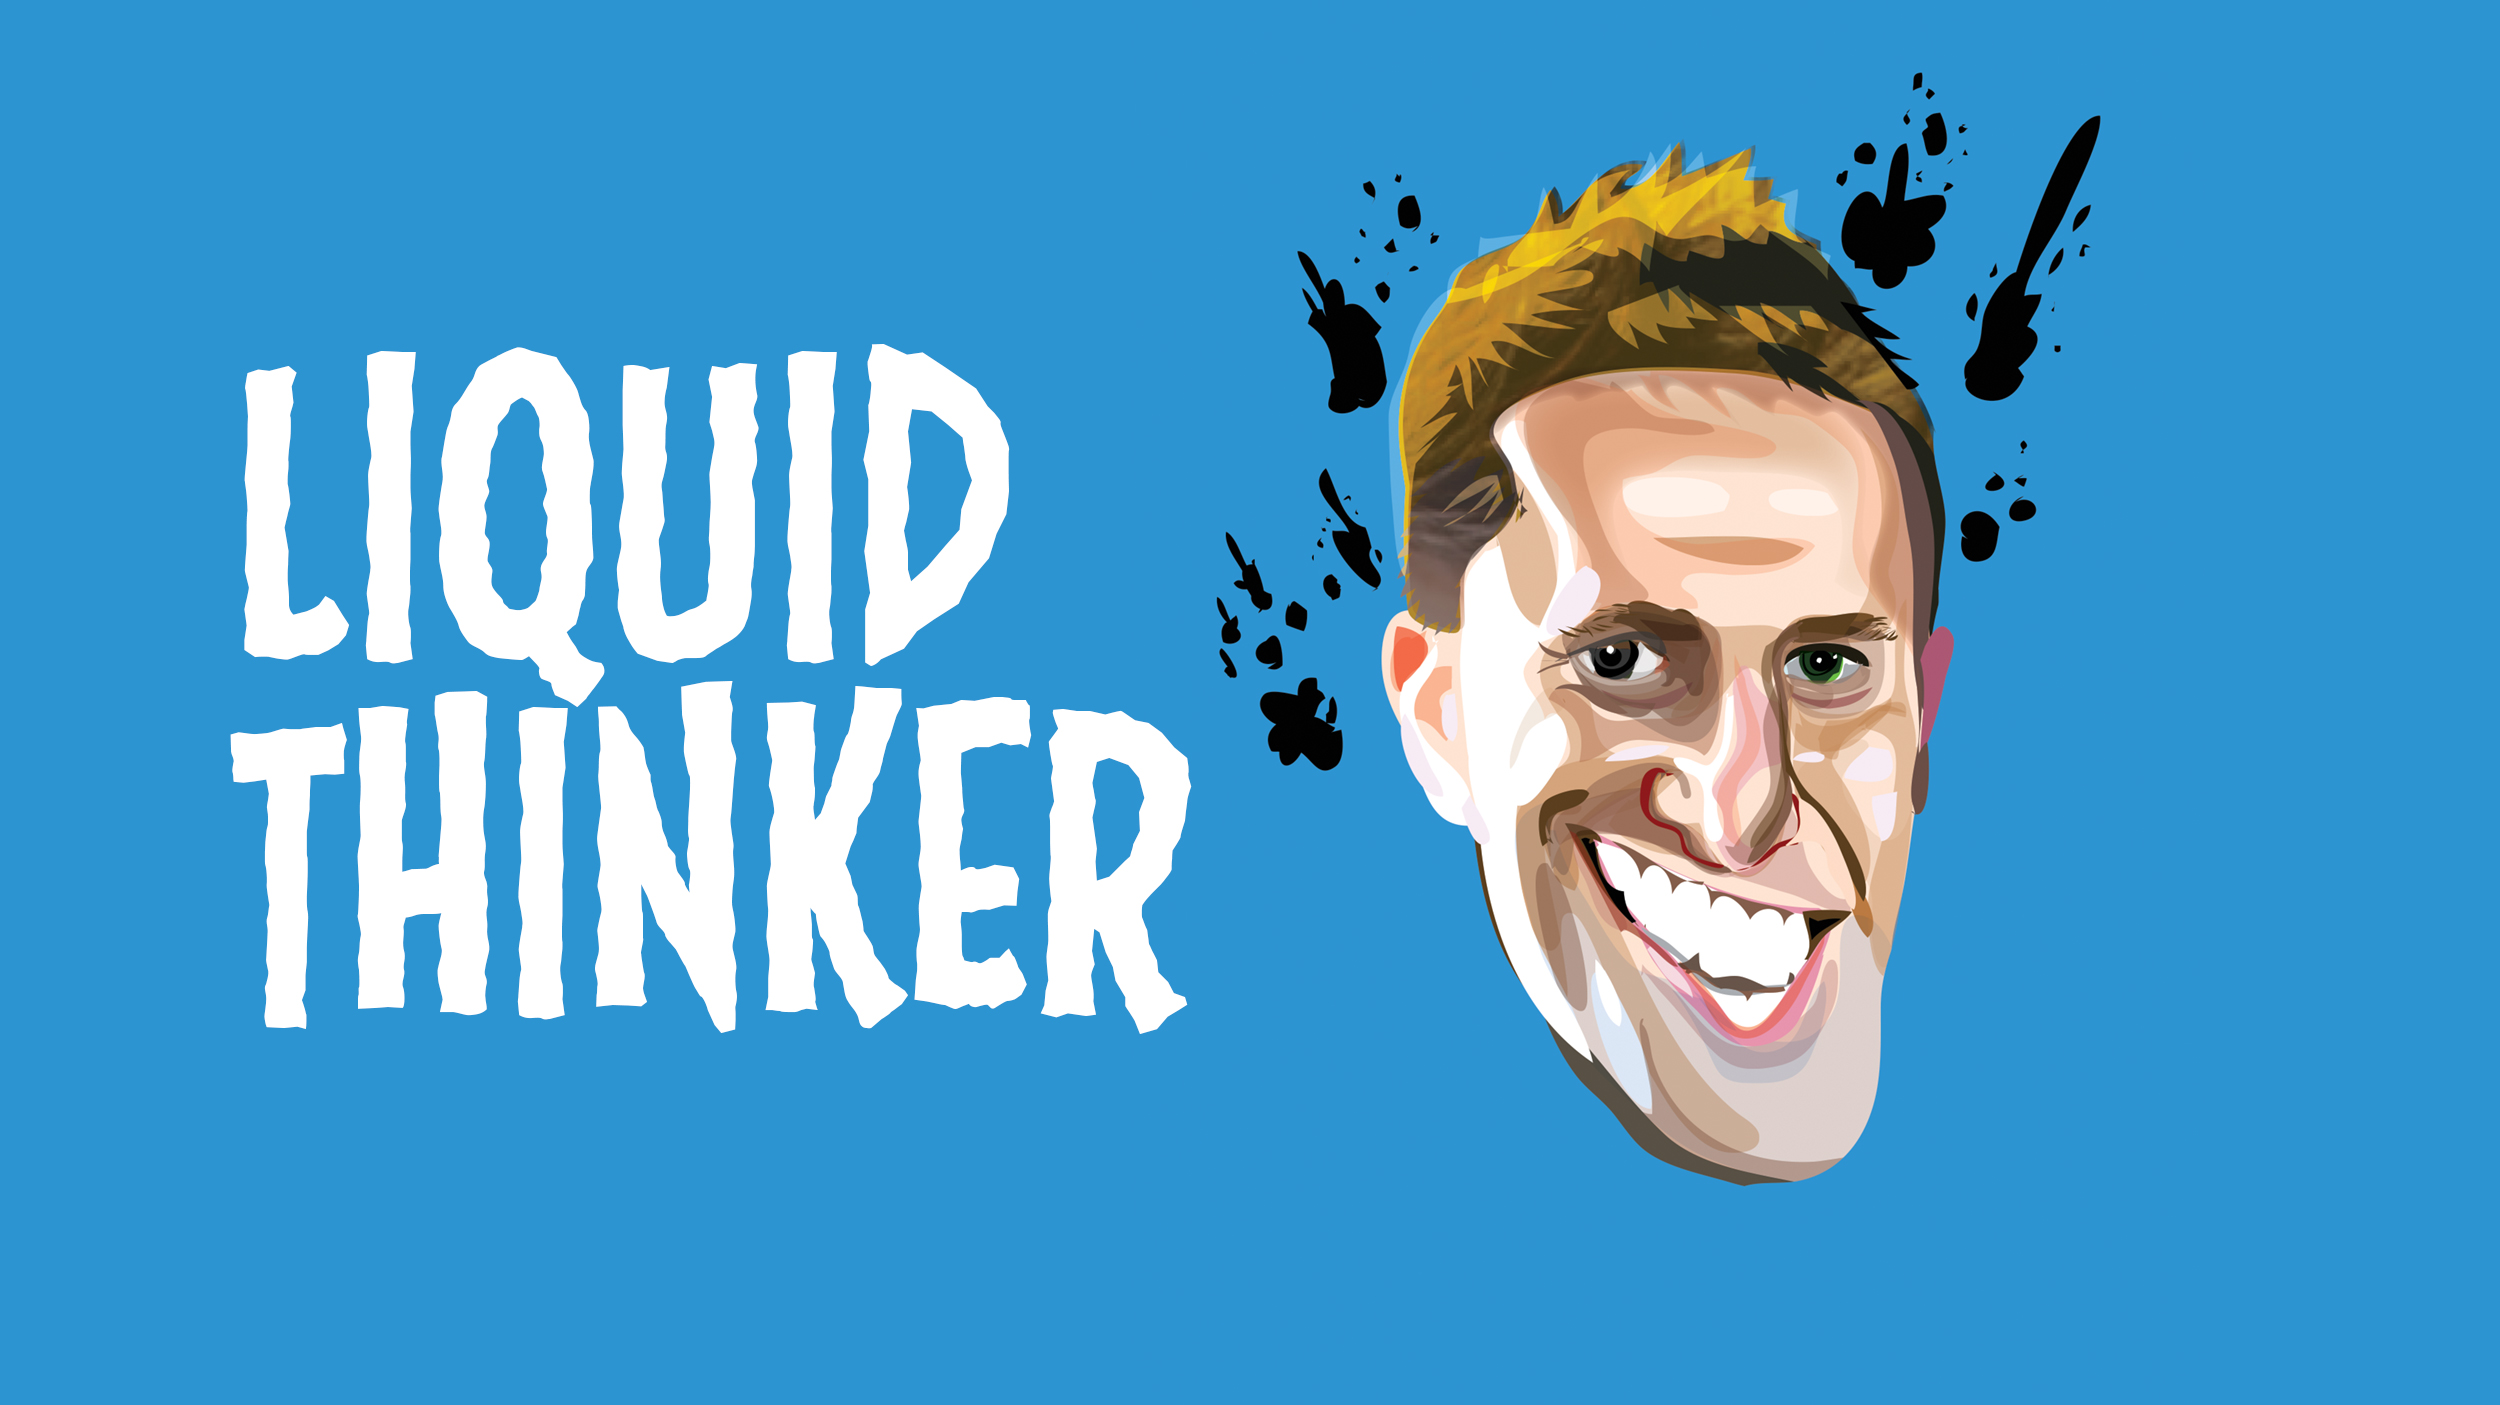 liquid-thinker-illustration-cognitive.jpg